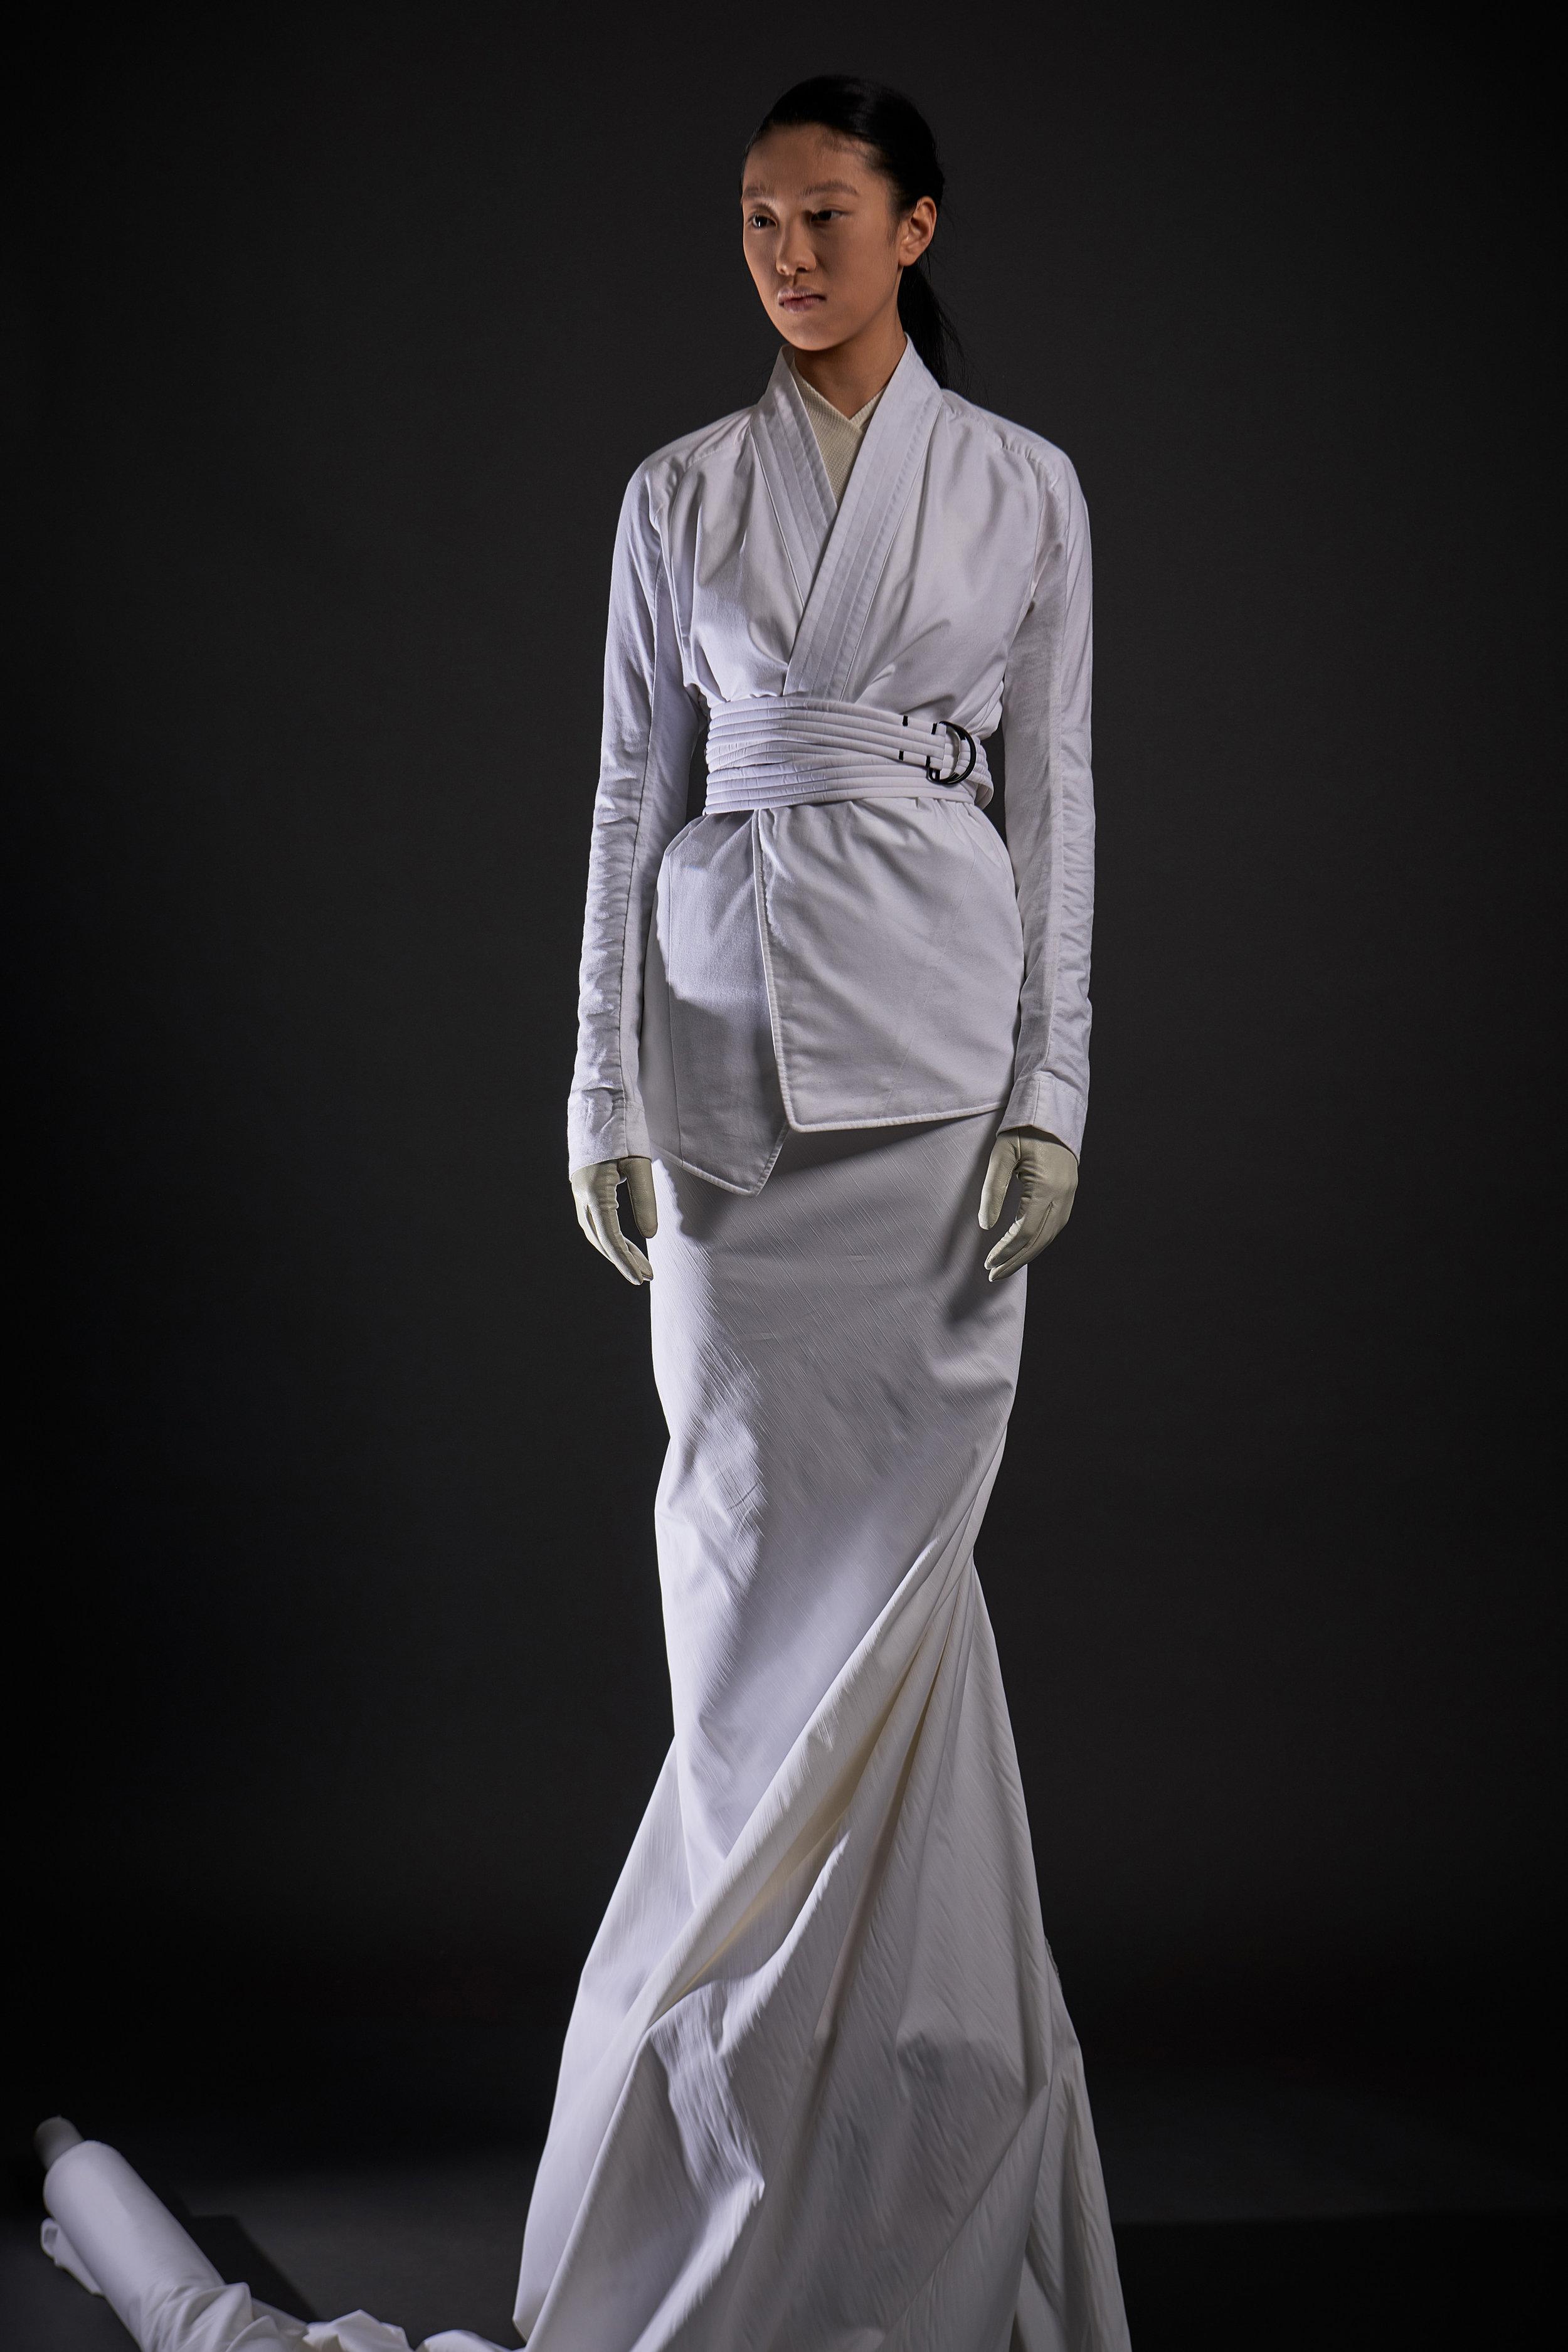 Look 7   ARC Kimono Shirt  / White   ARC Obi Belt  / White